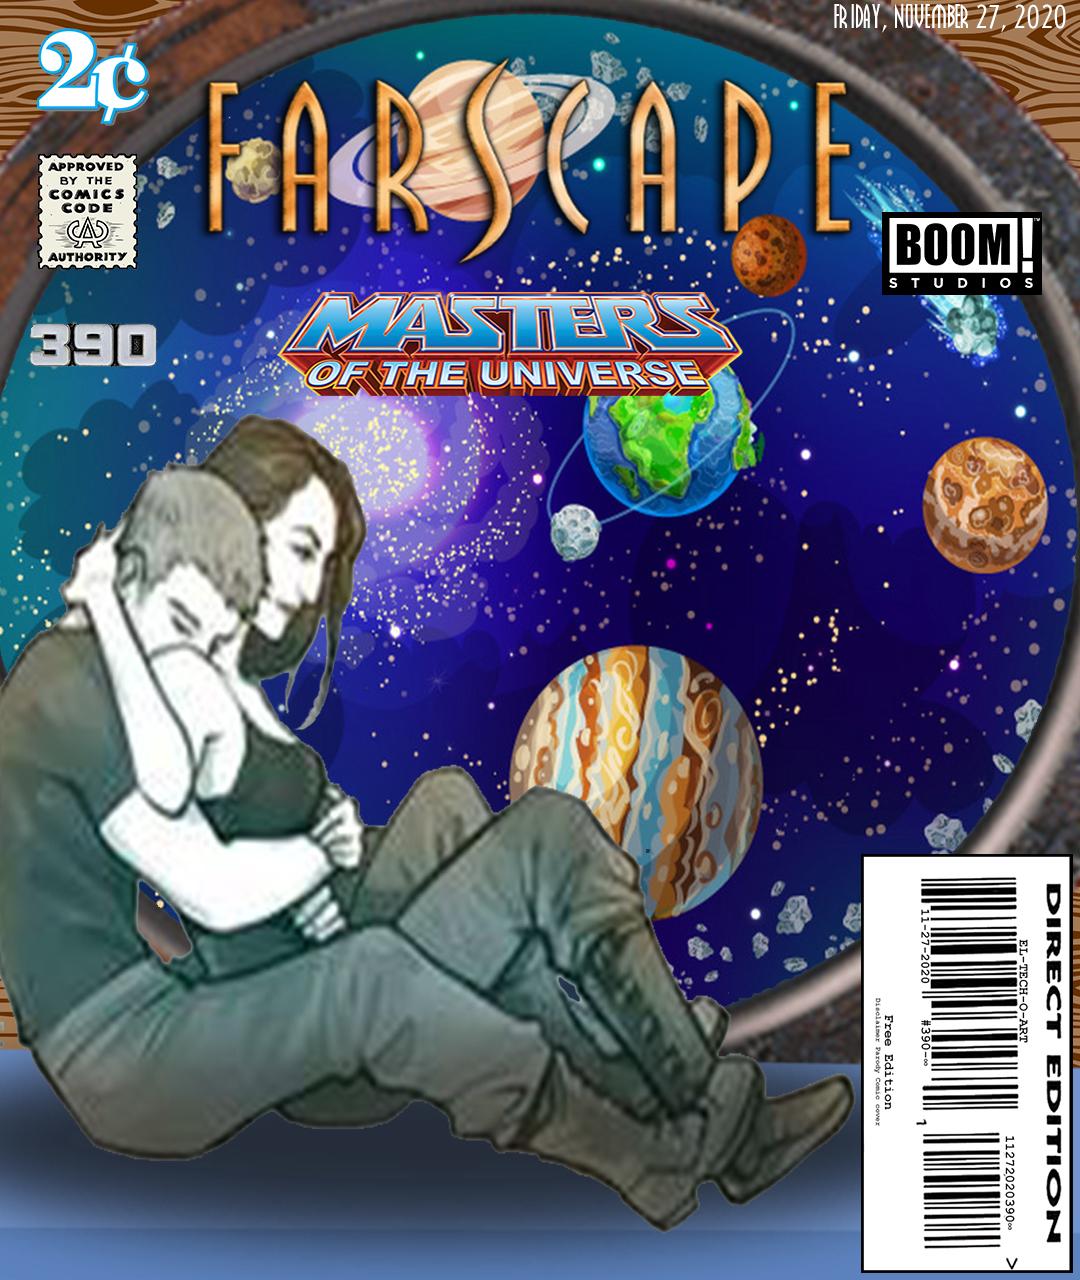 Fan Photoshop Edit Comic Cover of Farscape Masters